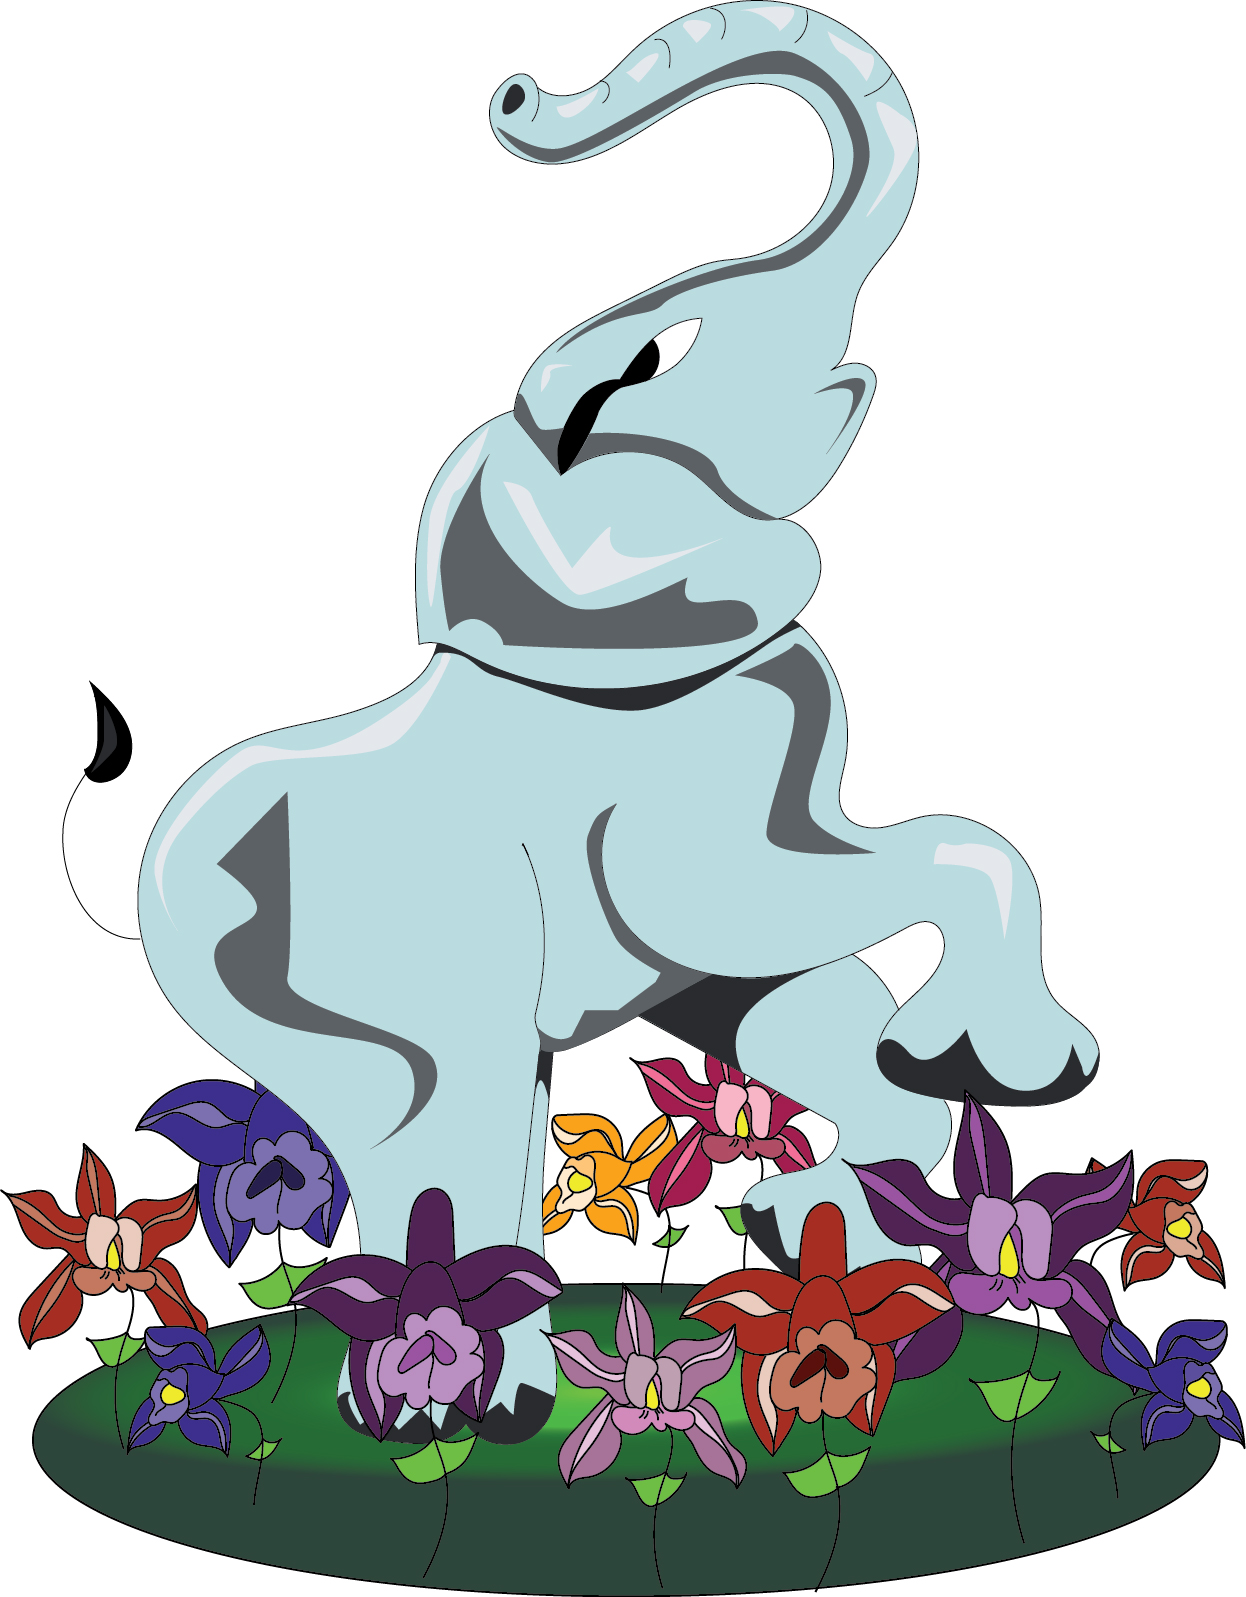 Elephant_Flowers